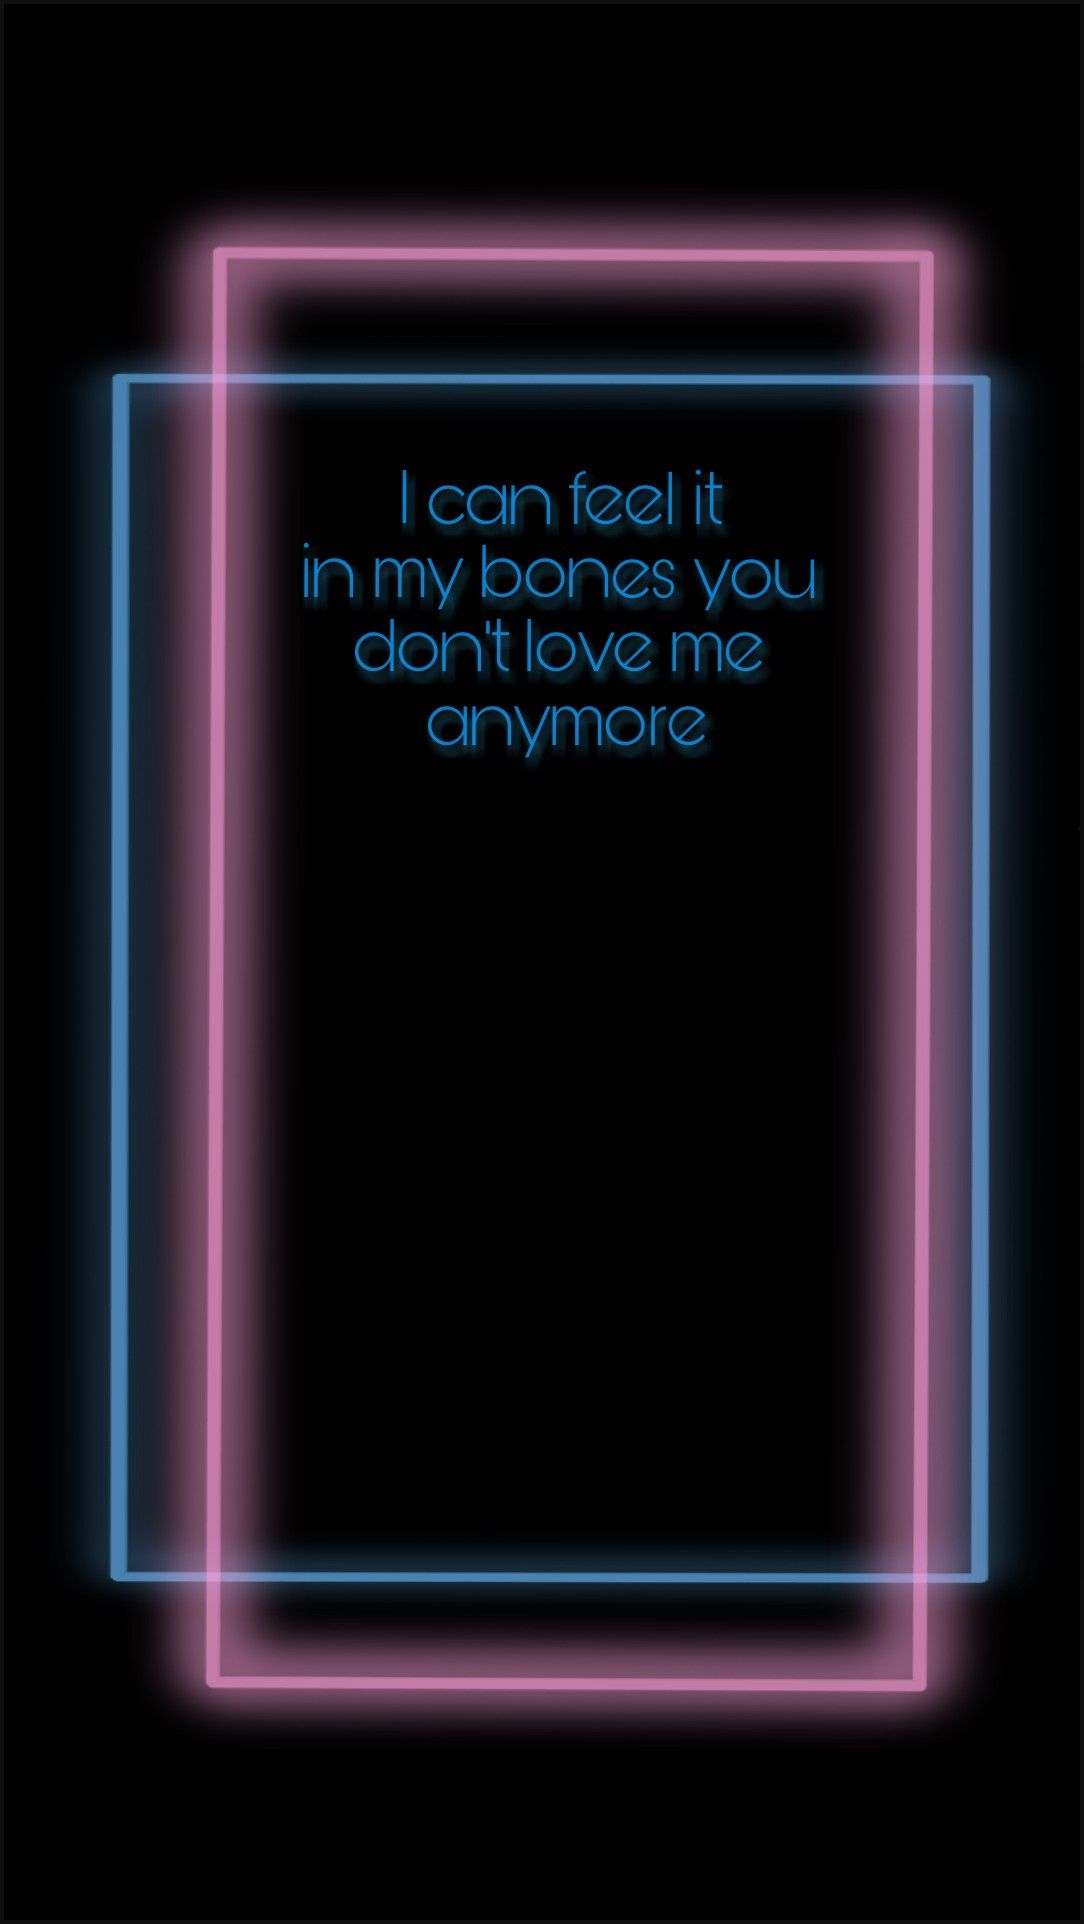 When You Walk Away 5sos Lyrics Wallpaper 5sos Lyrics 5sos